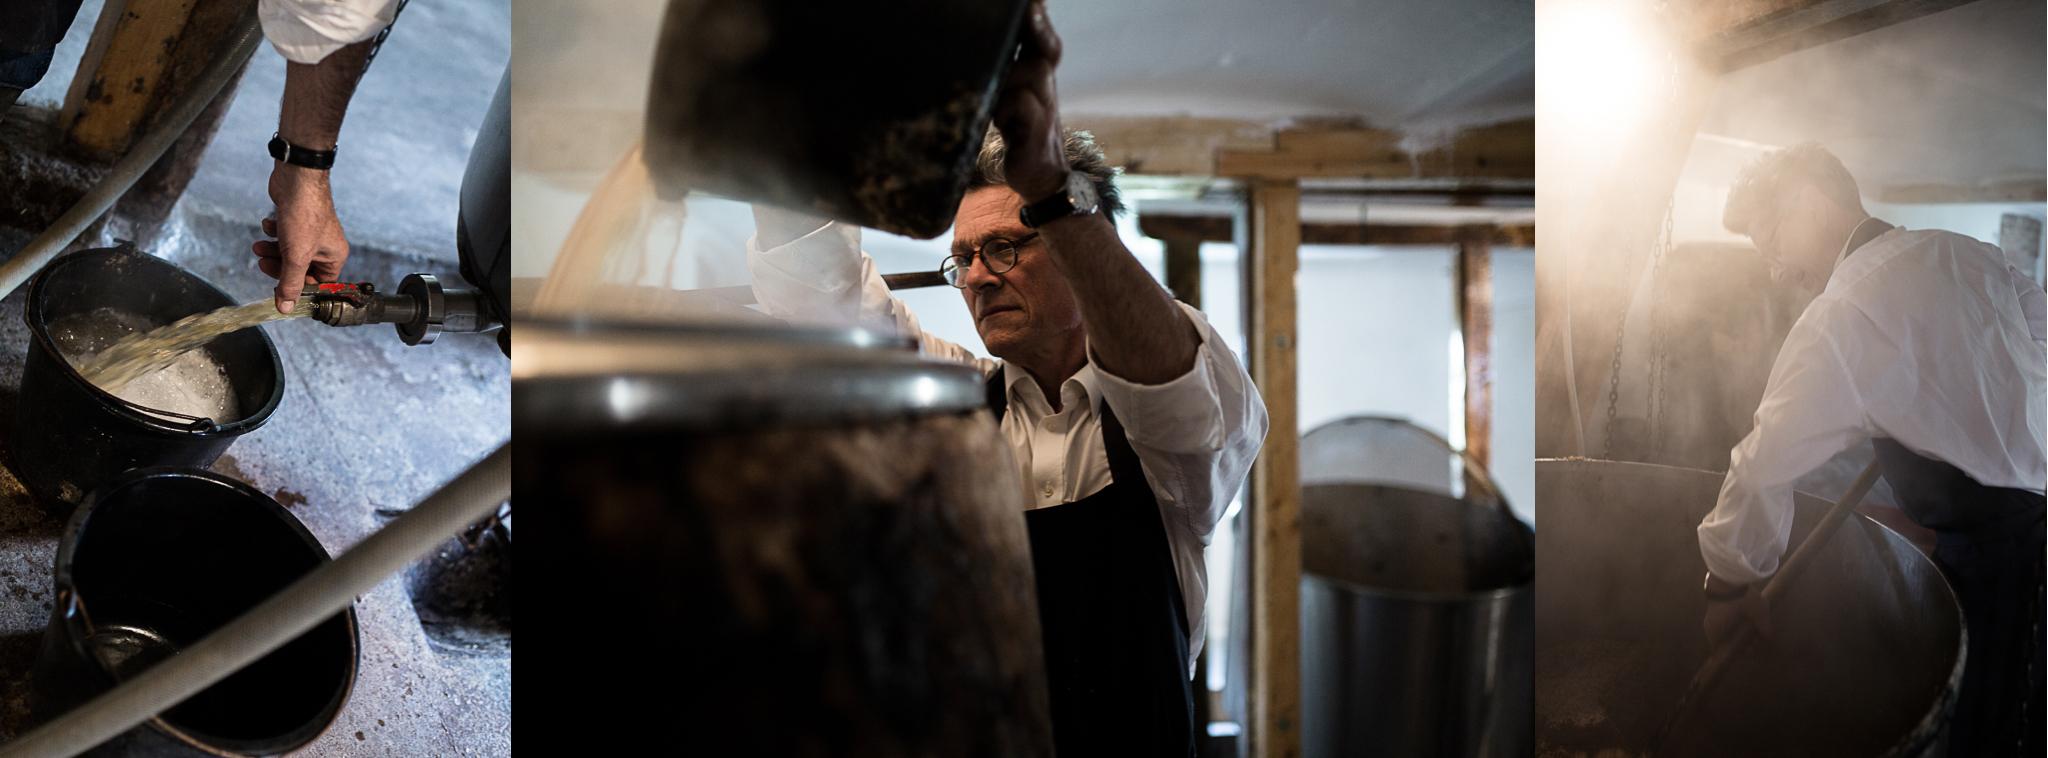 Riegg & Partner Bogedal Brewery Brauerei Vejle Dänemark Bøgedal